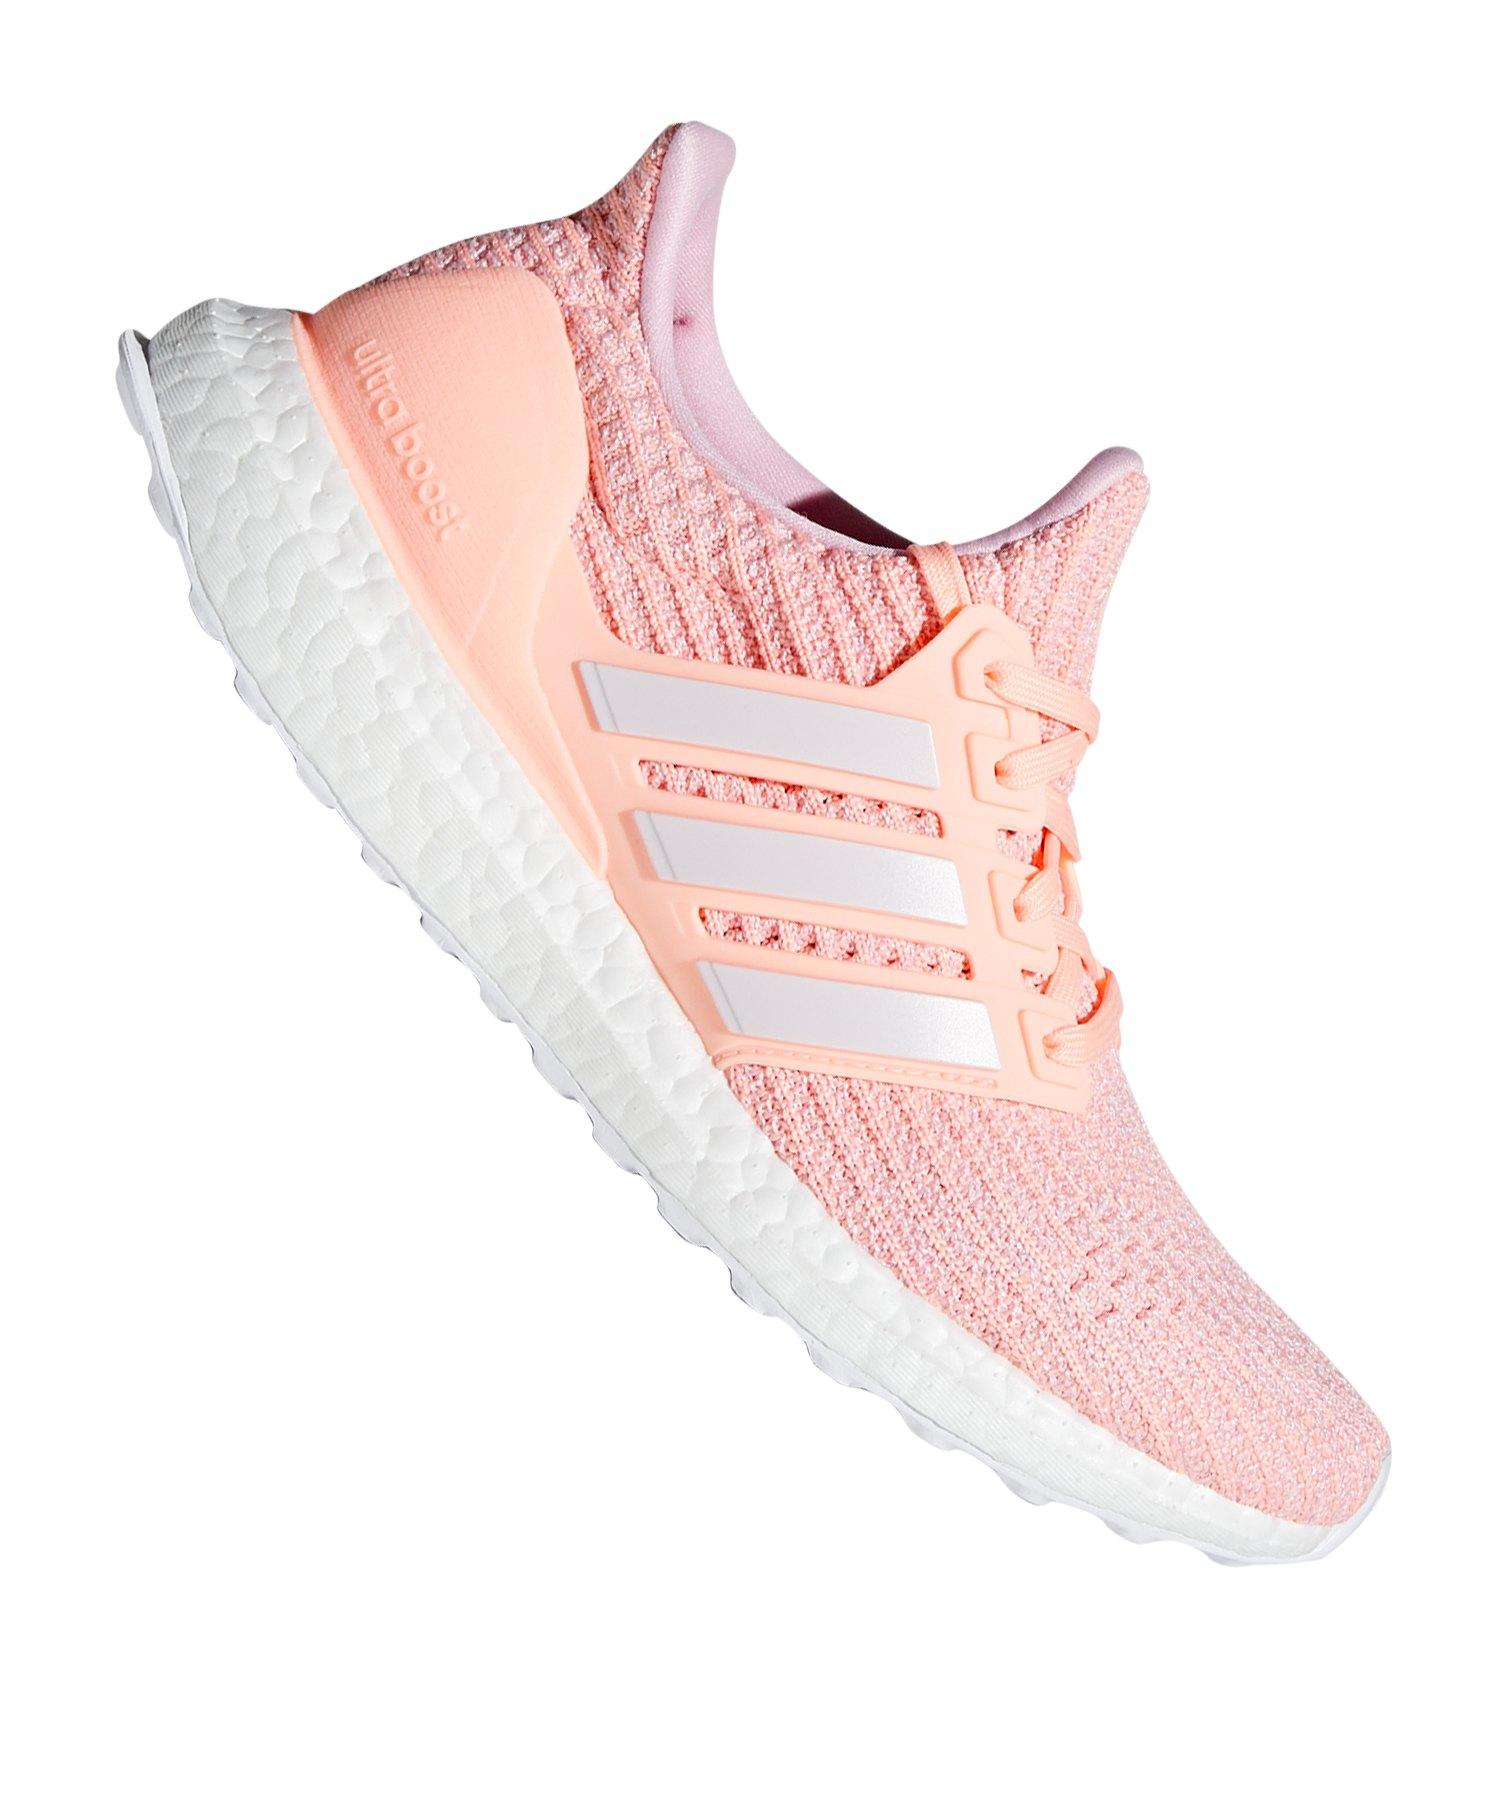 designer fashion a37ce 2251c adidas Ultra Boost Sneaker Damen Rosa Weiss - rosa